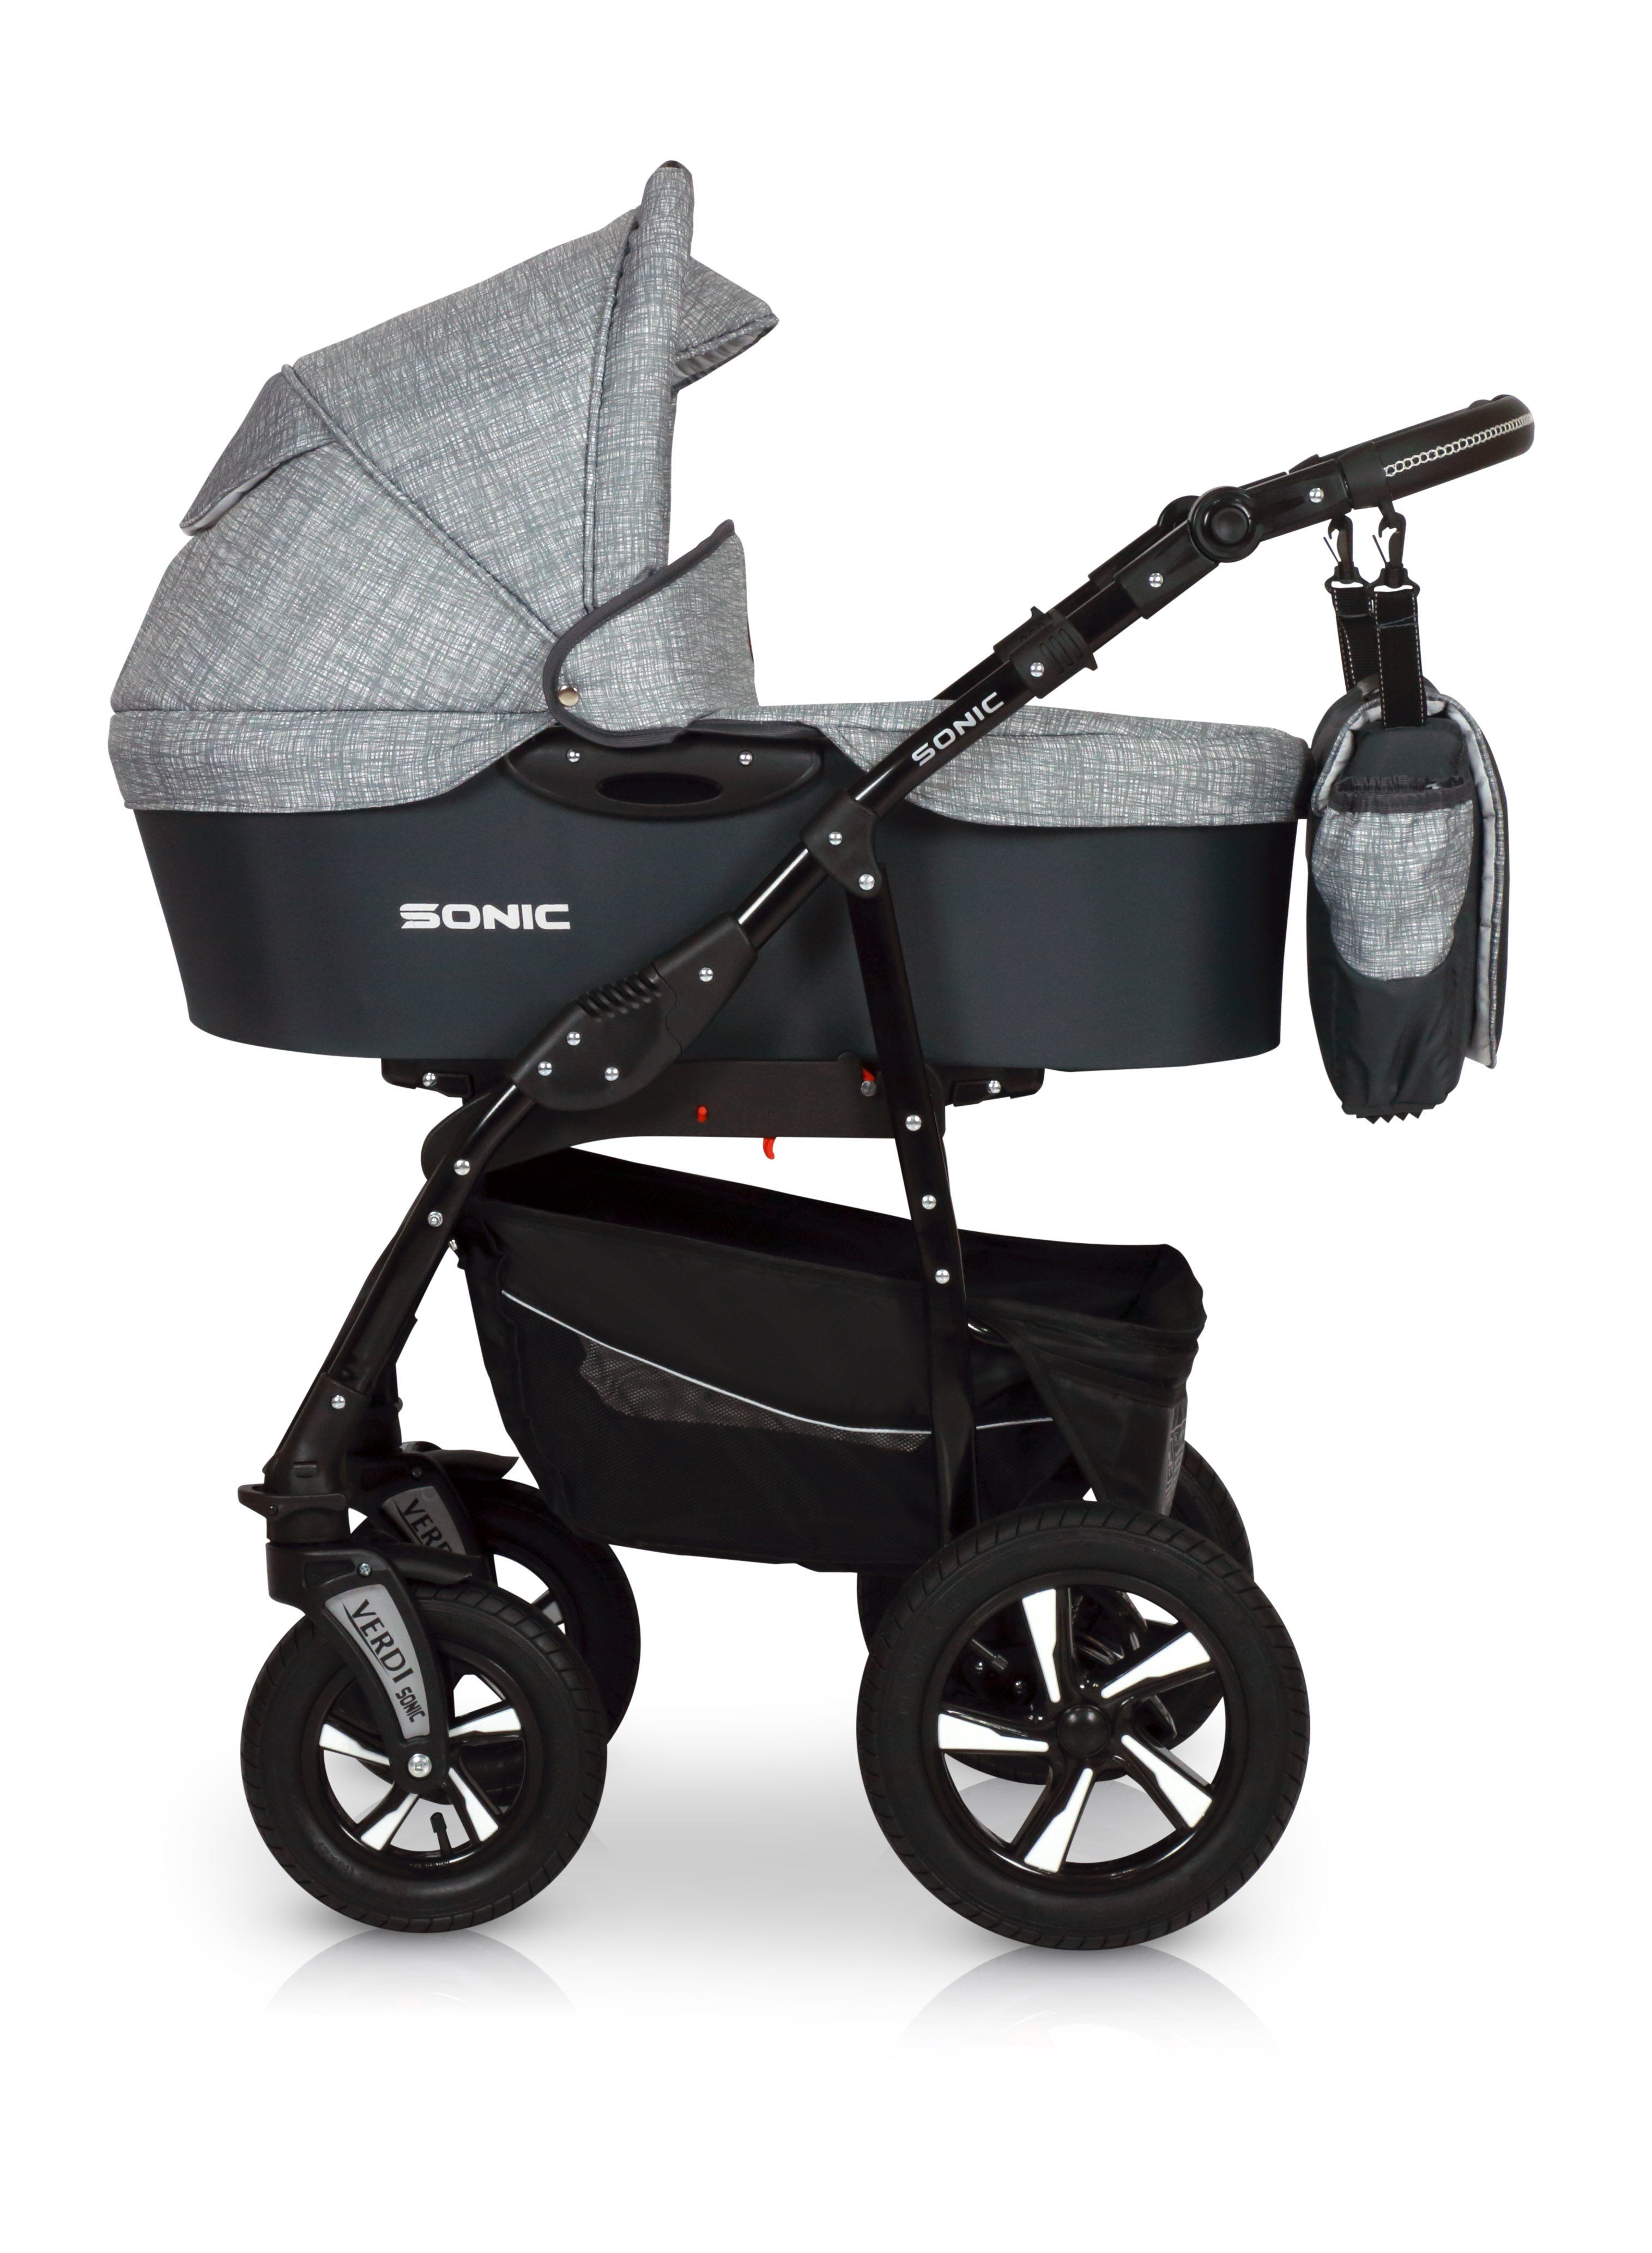 SONIC Comfort Line 3in1 Pram stroller, Car seats, Children